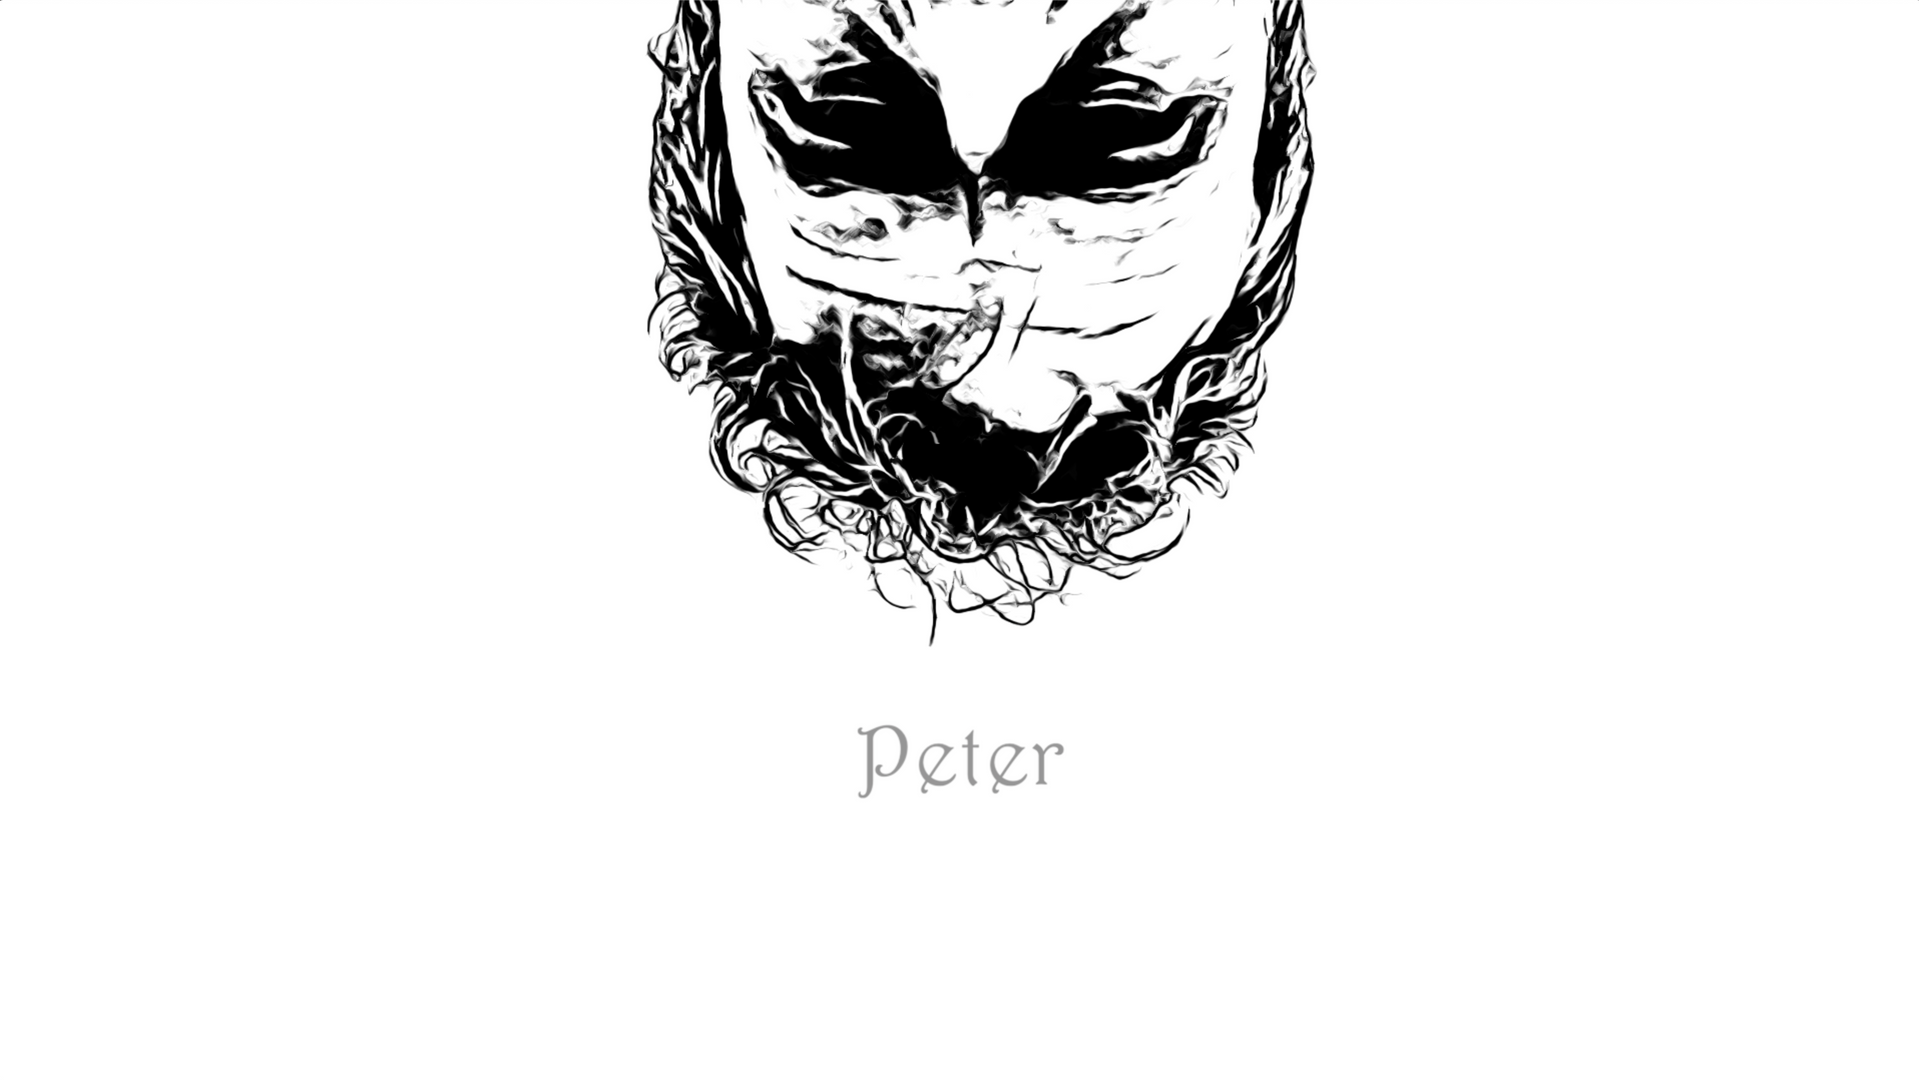 Peter #12